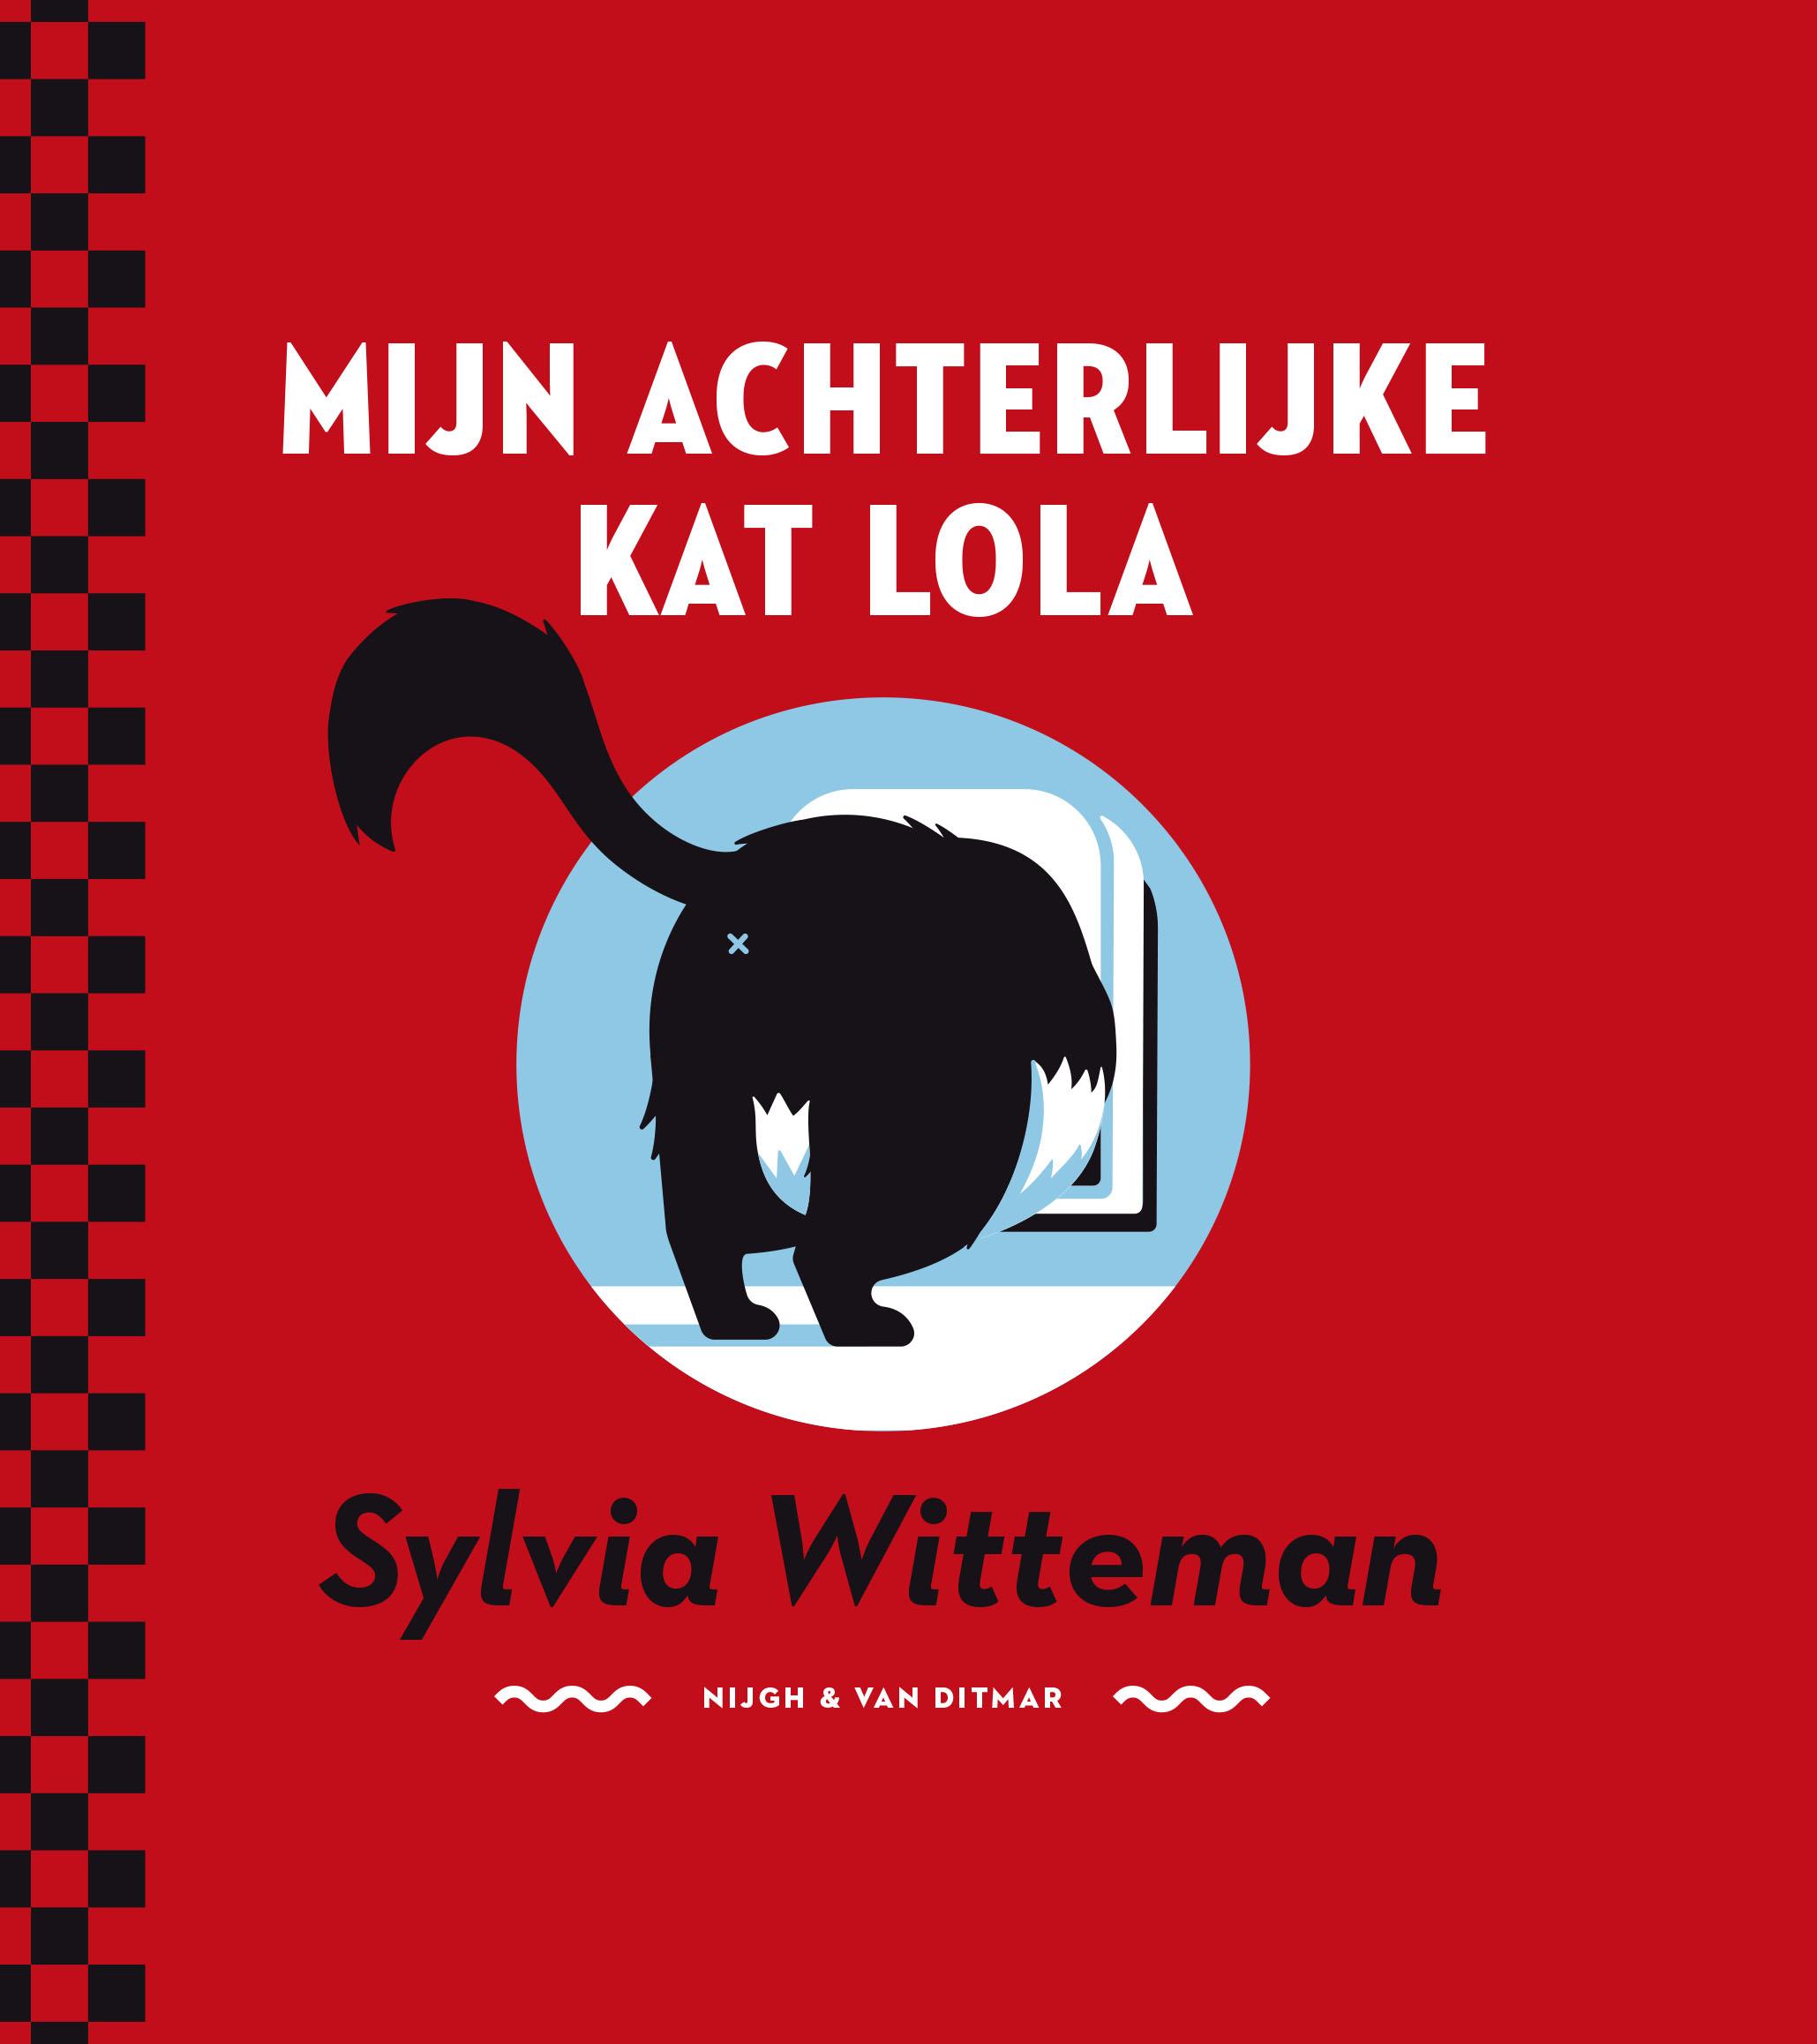 Mijn achterlijke kat Lola – Sylvia Witteman